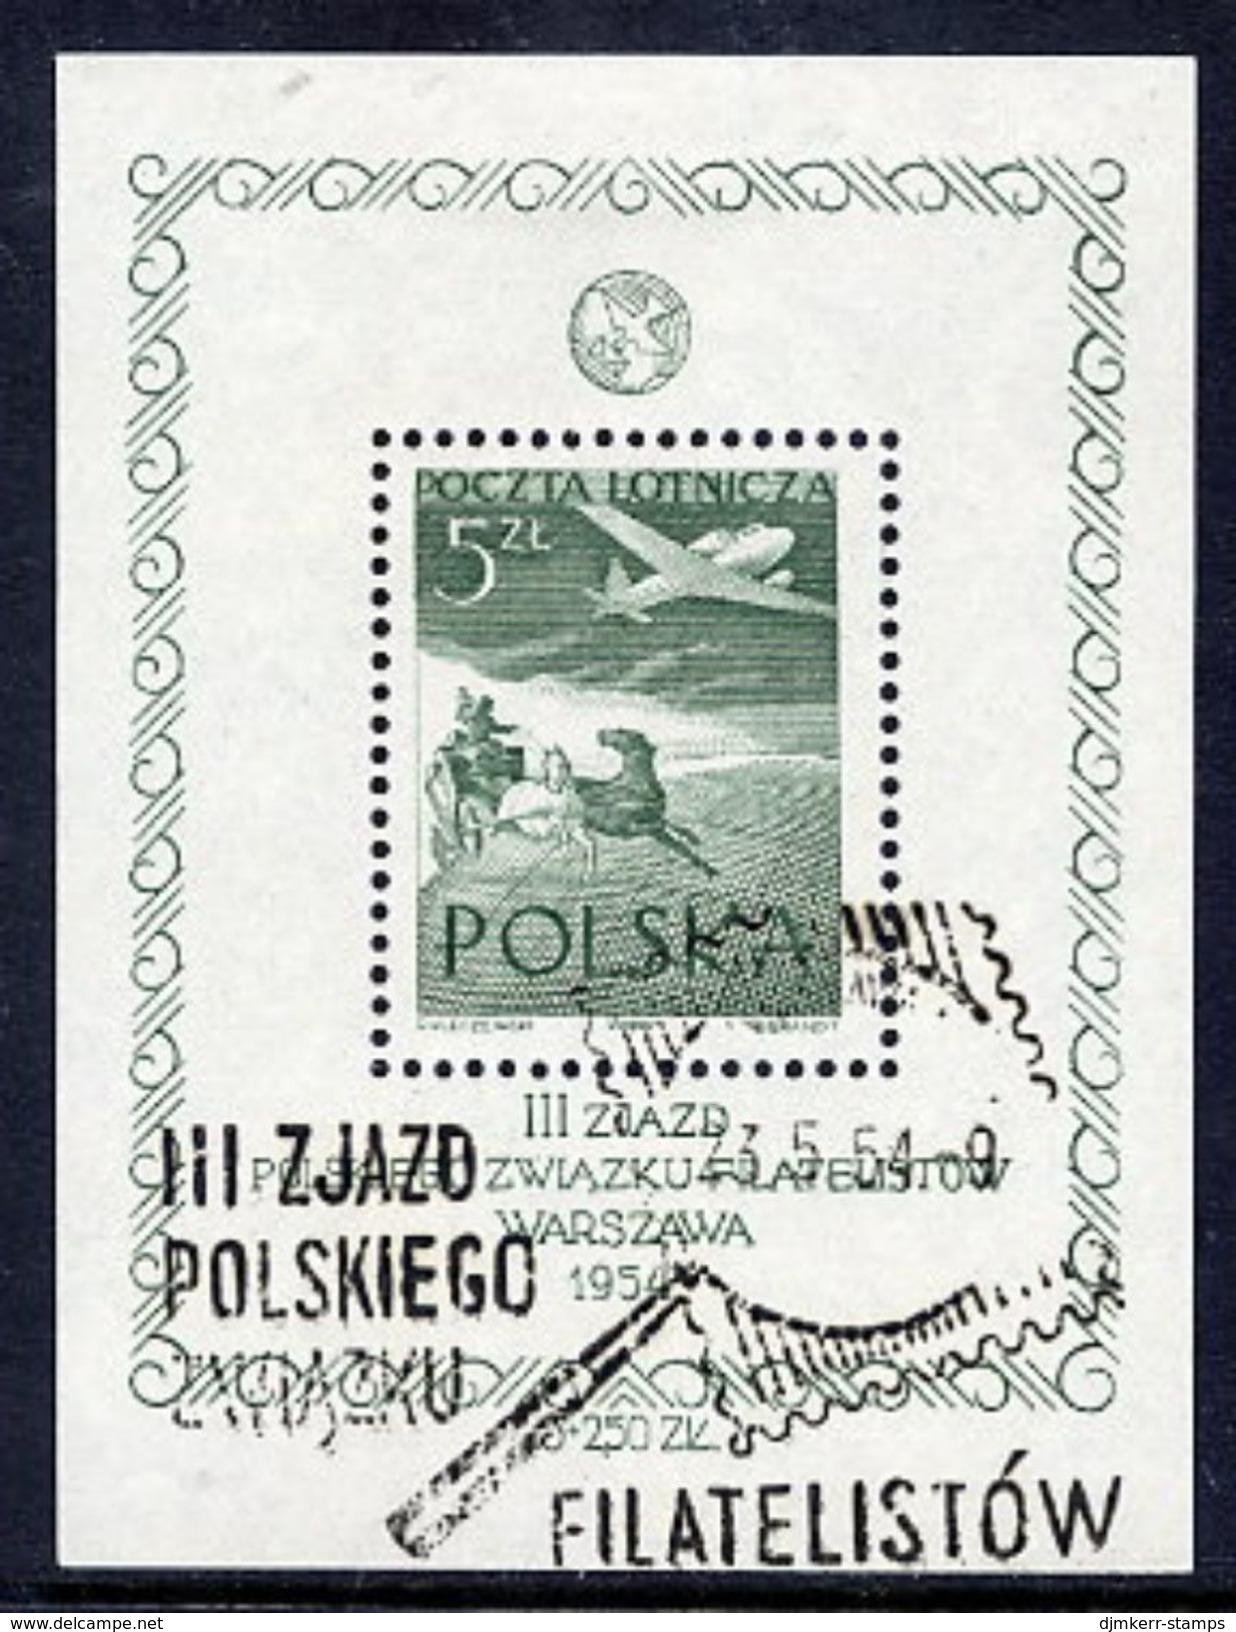 POLAND 1954 Philatelic Congress Block Used..  Michel Block 13 - Blocks & Sheetlets & Panes